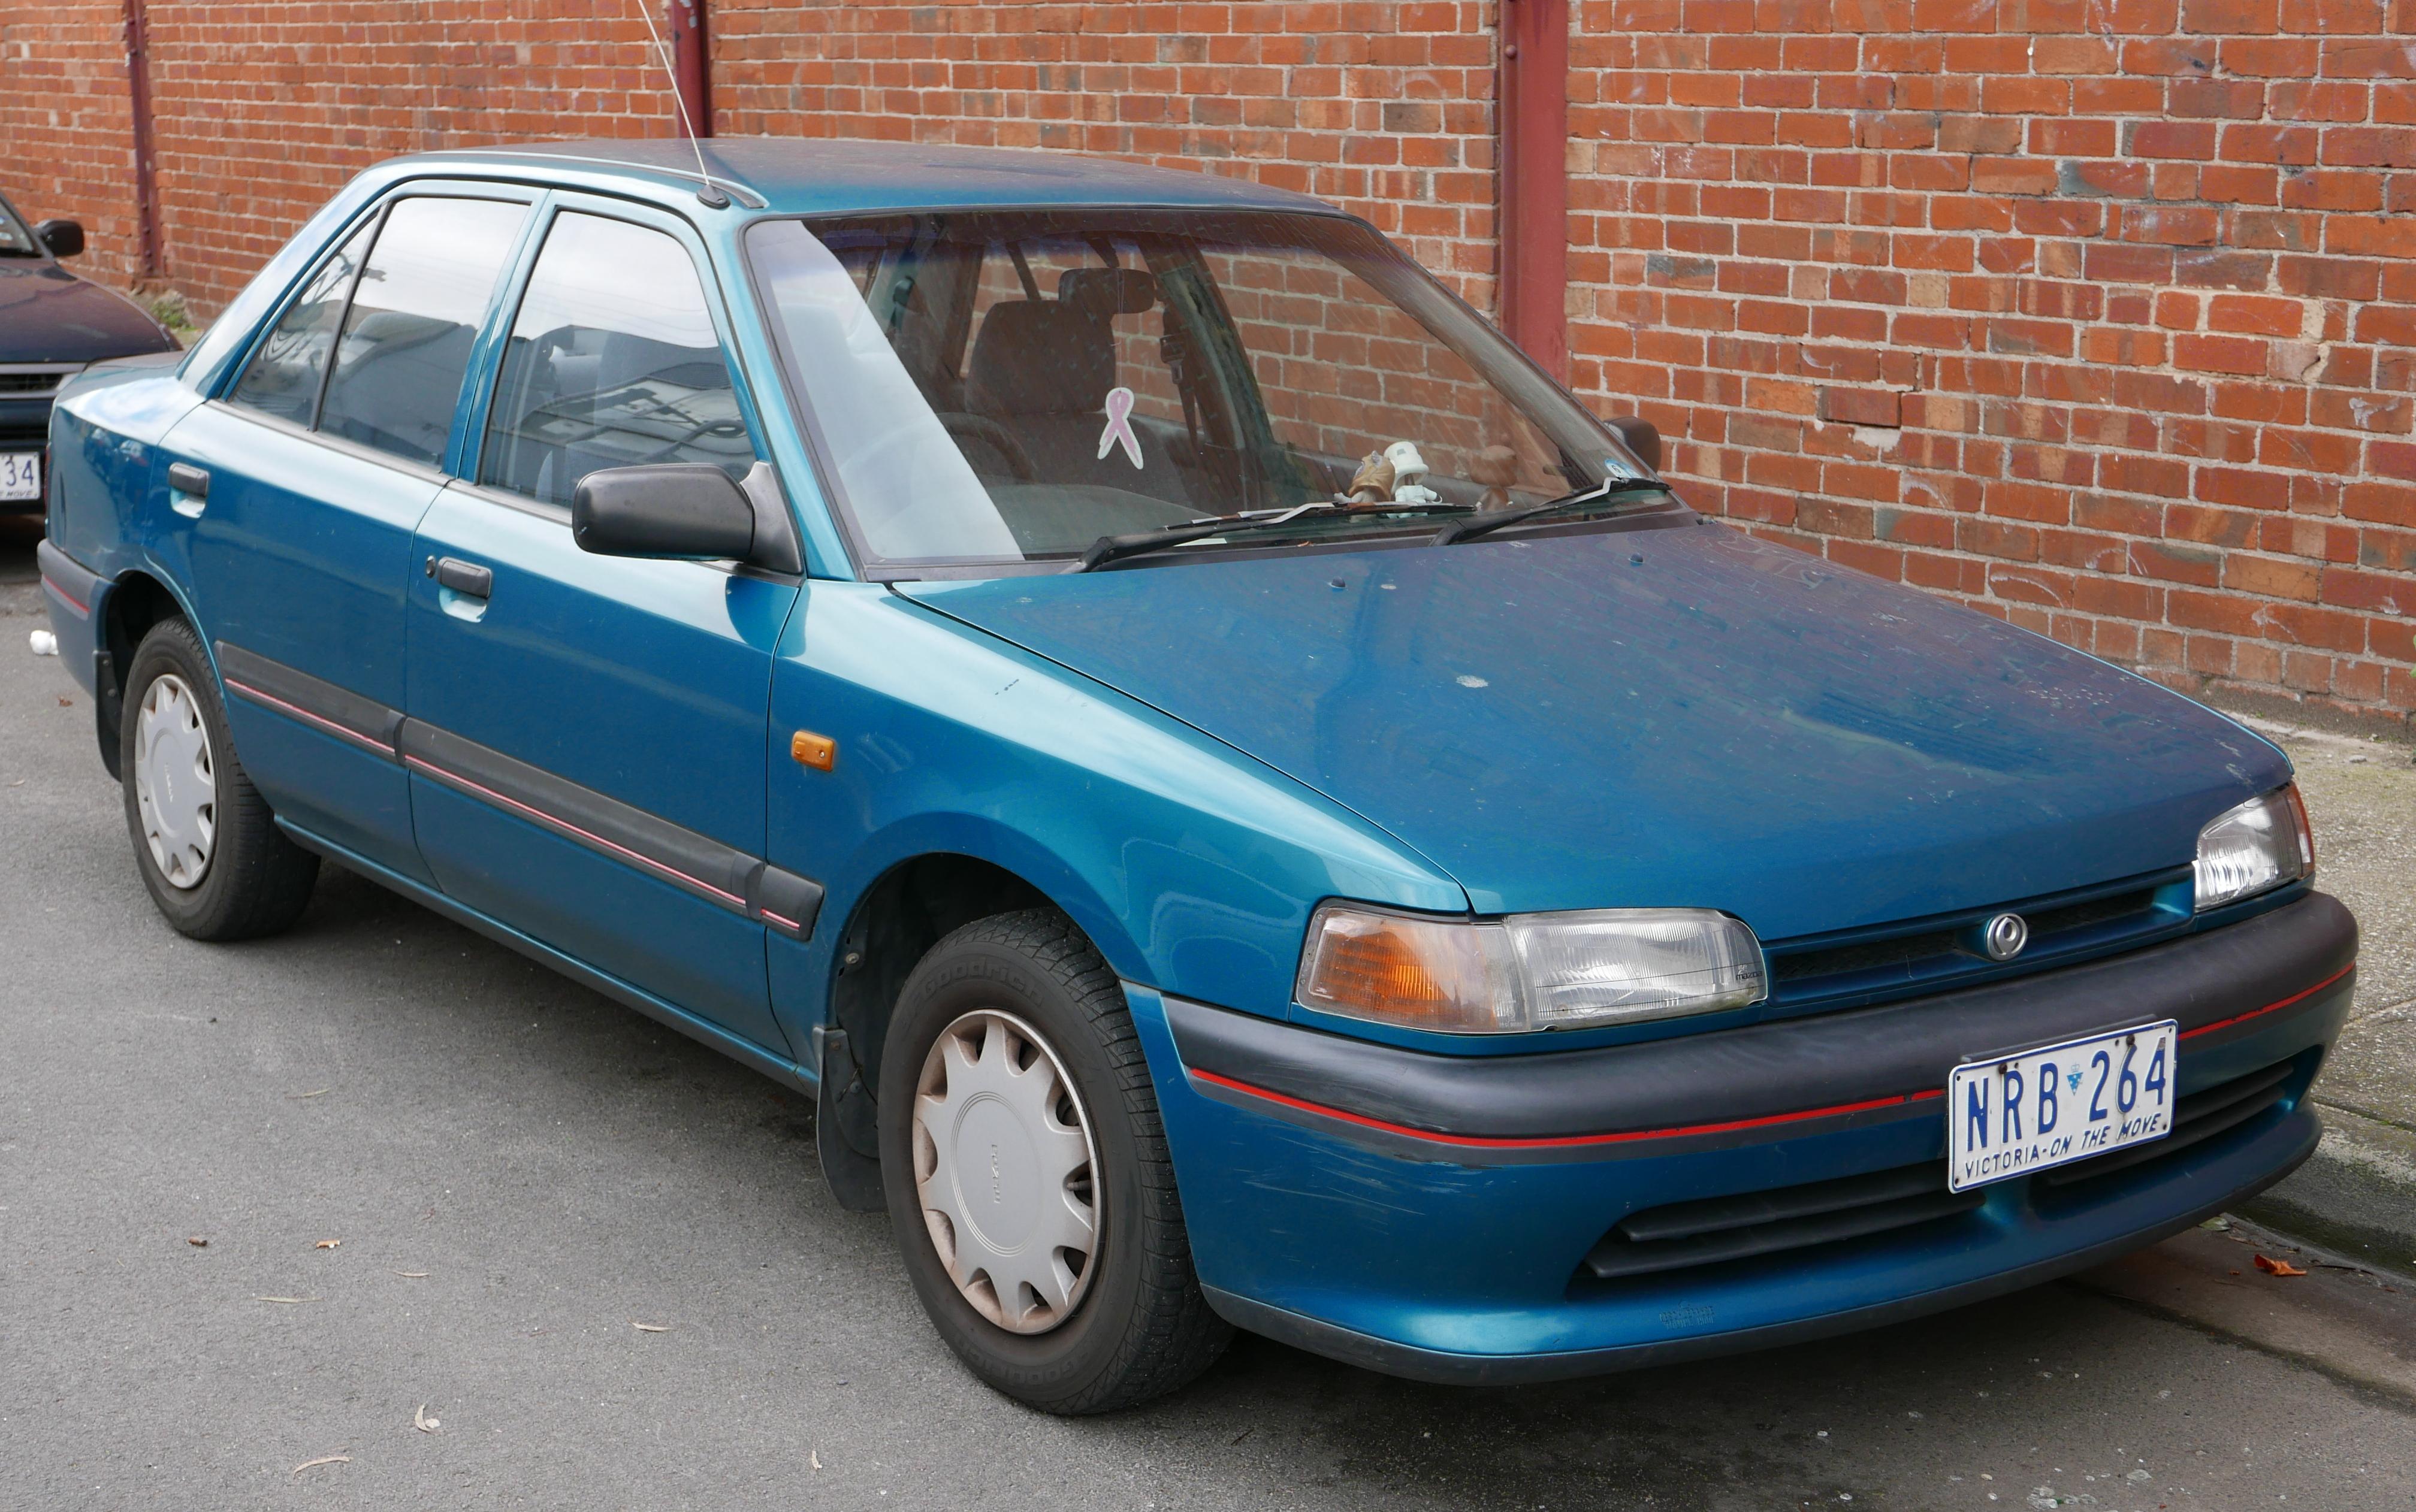 File:1995 Mazda 323 (BG Series 2) 1.6 sedan (2015-07